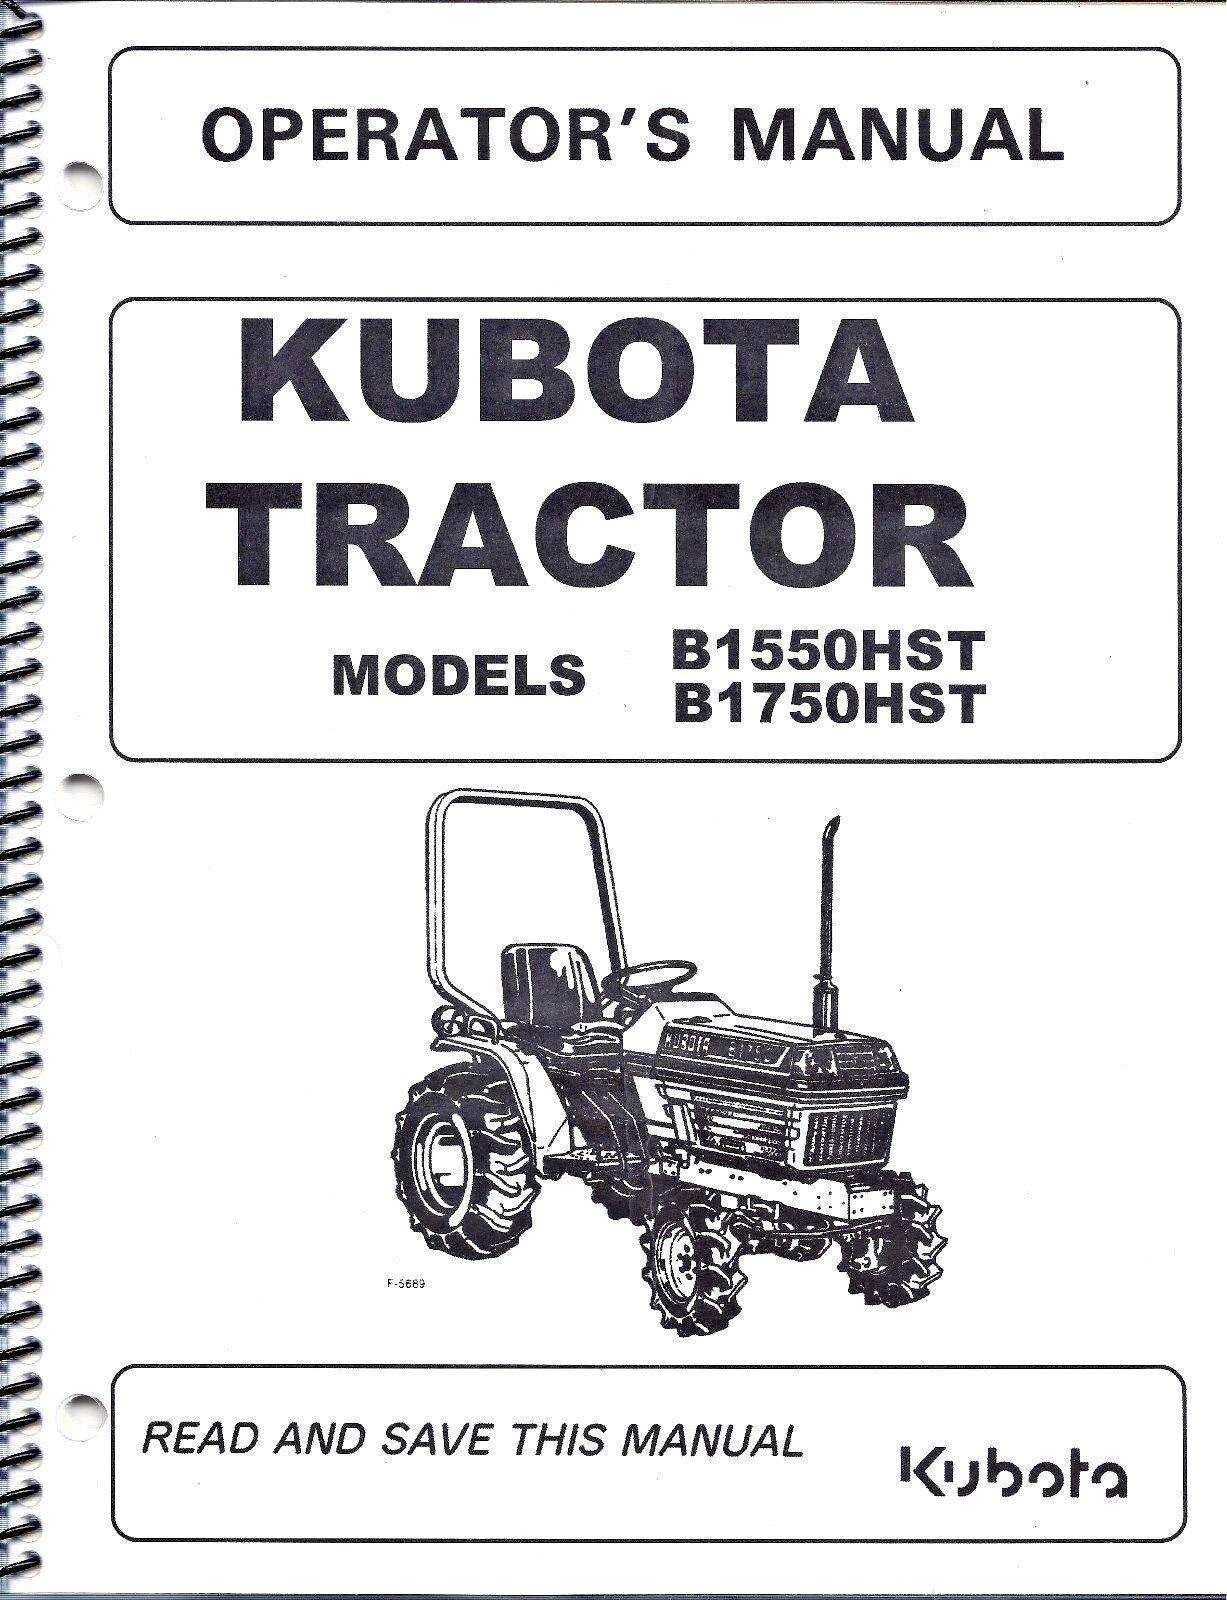 Kubota B1550 Schematic Trusted Wiring Diagram B6200 B1750hst Tractor Operator Manual Ebay Rh Com Deck Parts 54